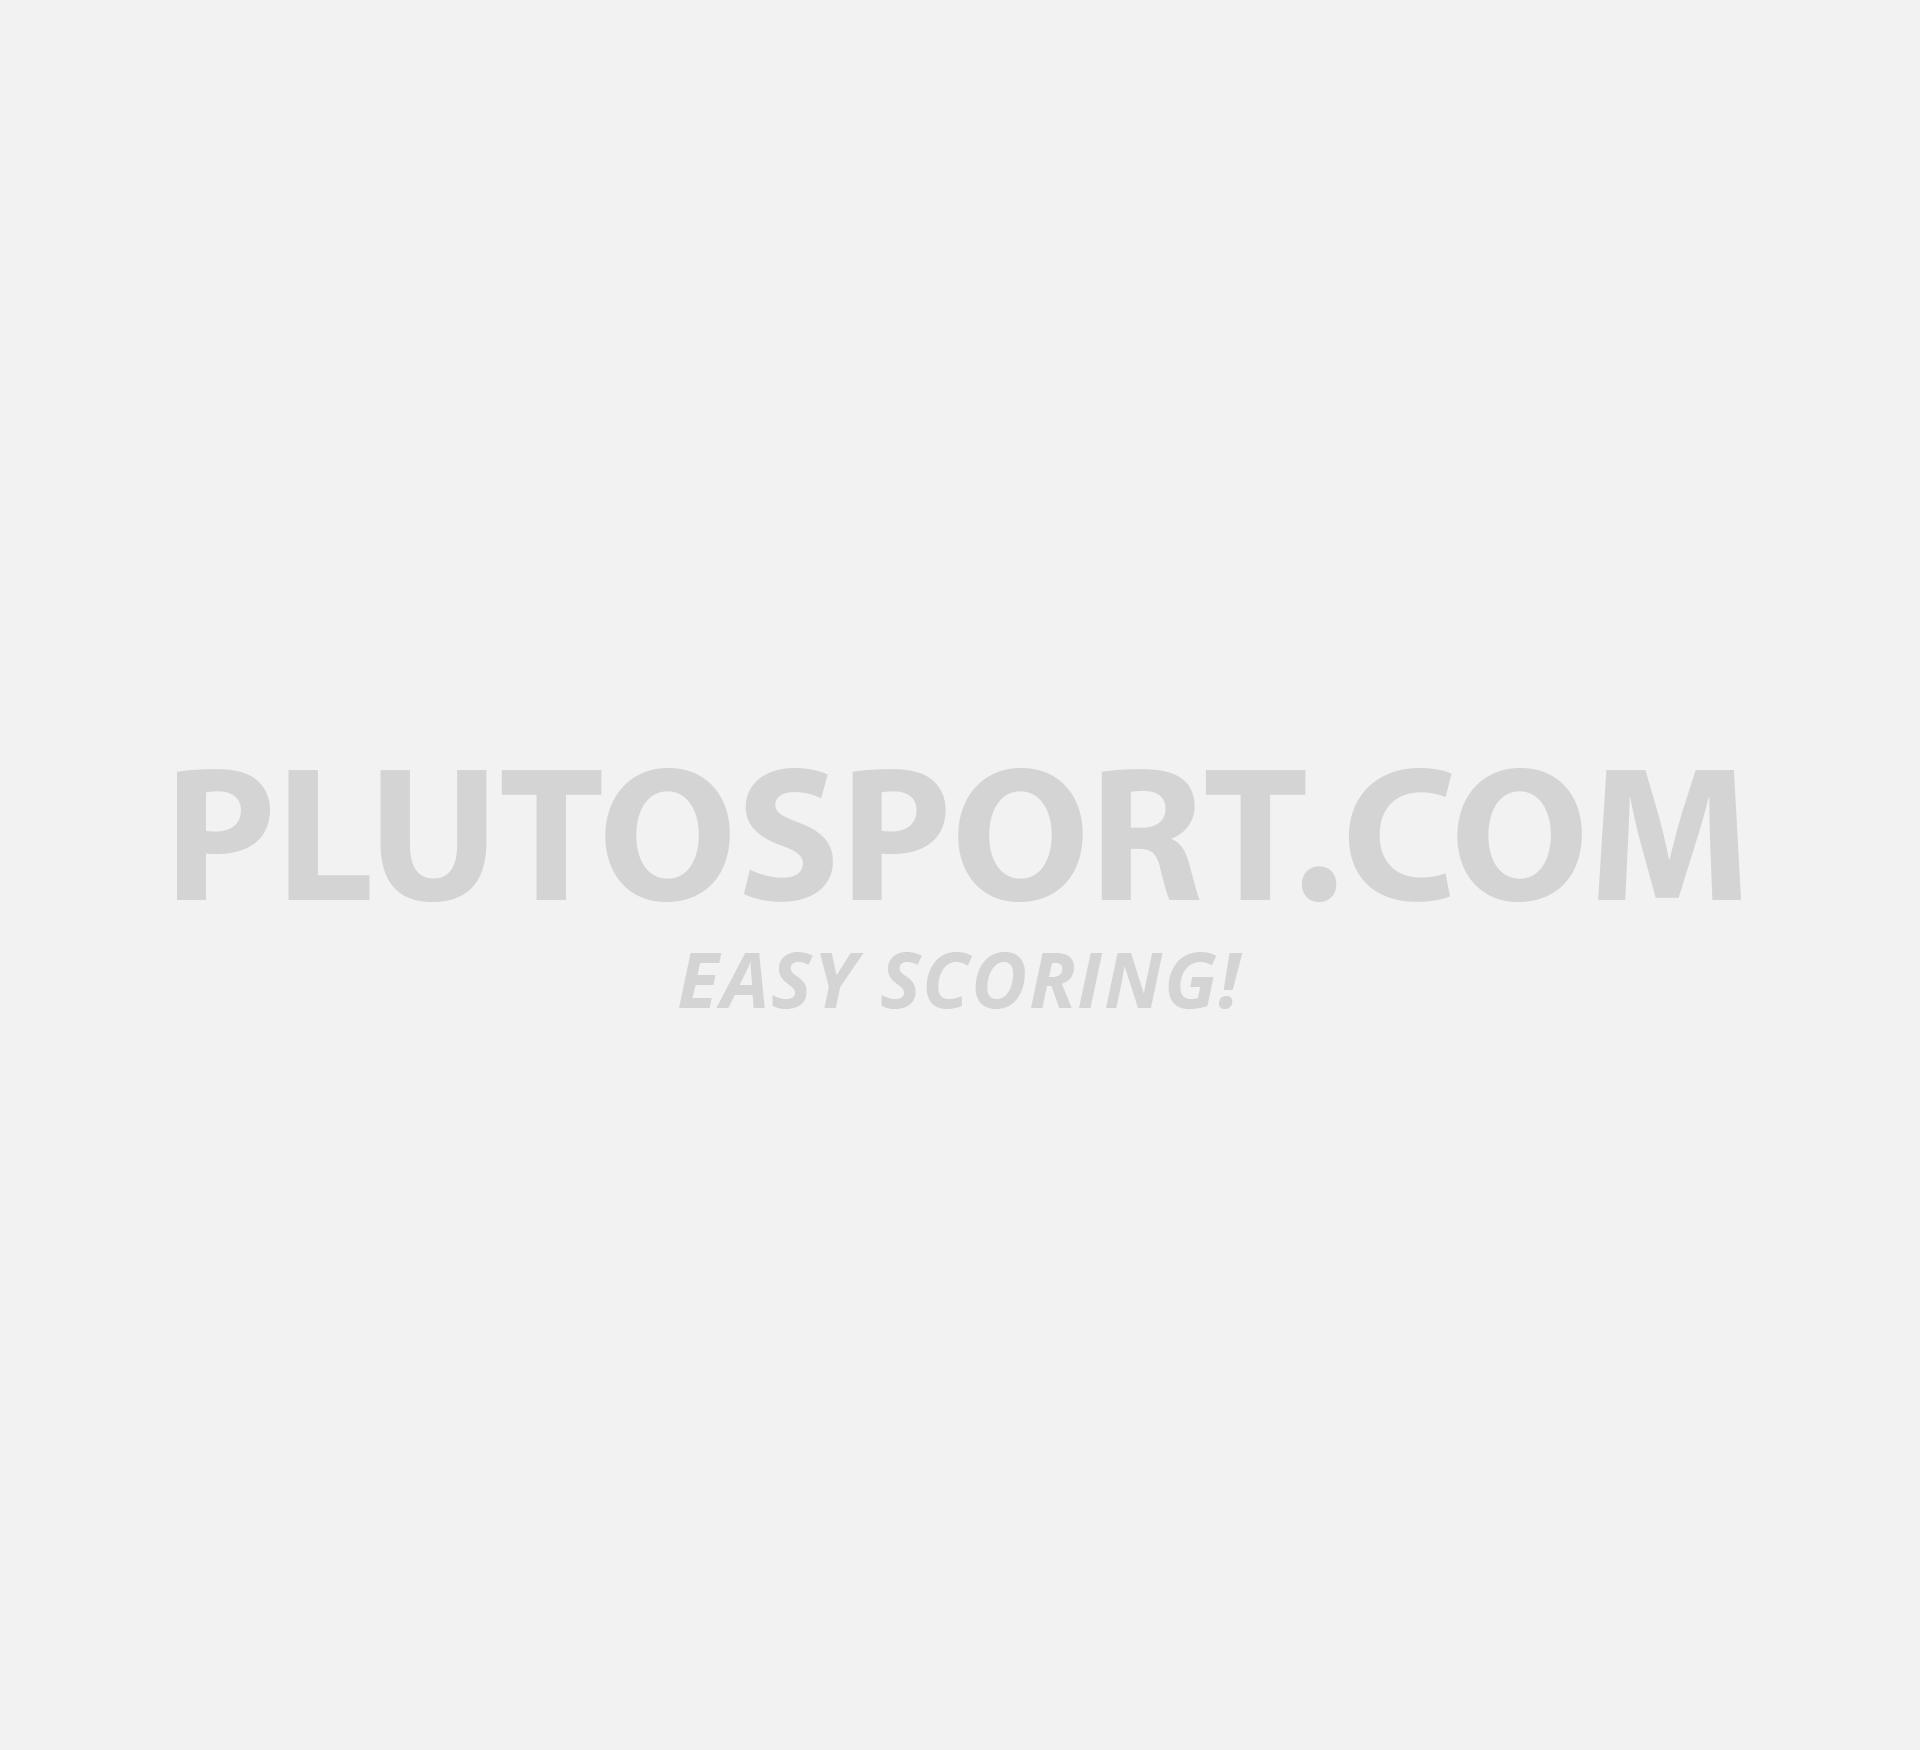 timeless design 05f55 940b2 Adidas Stan Smith W - Sneakers - Shoes - Lifestyle - Sports   Plutosport